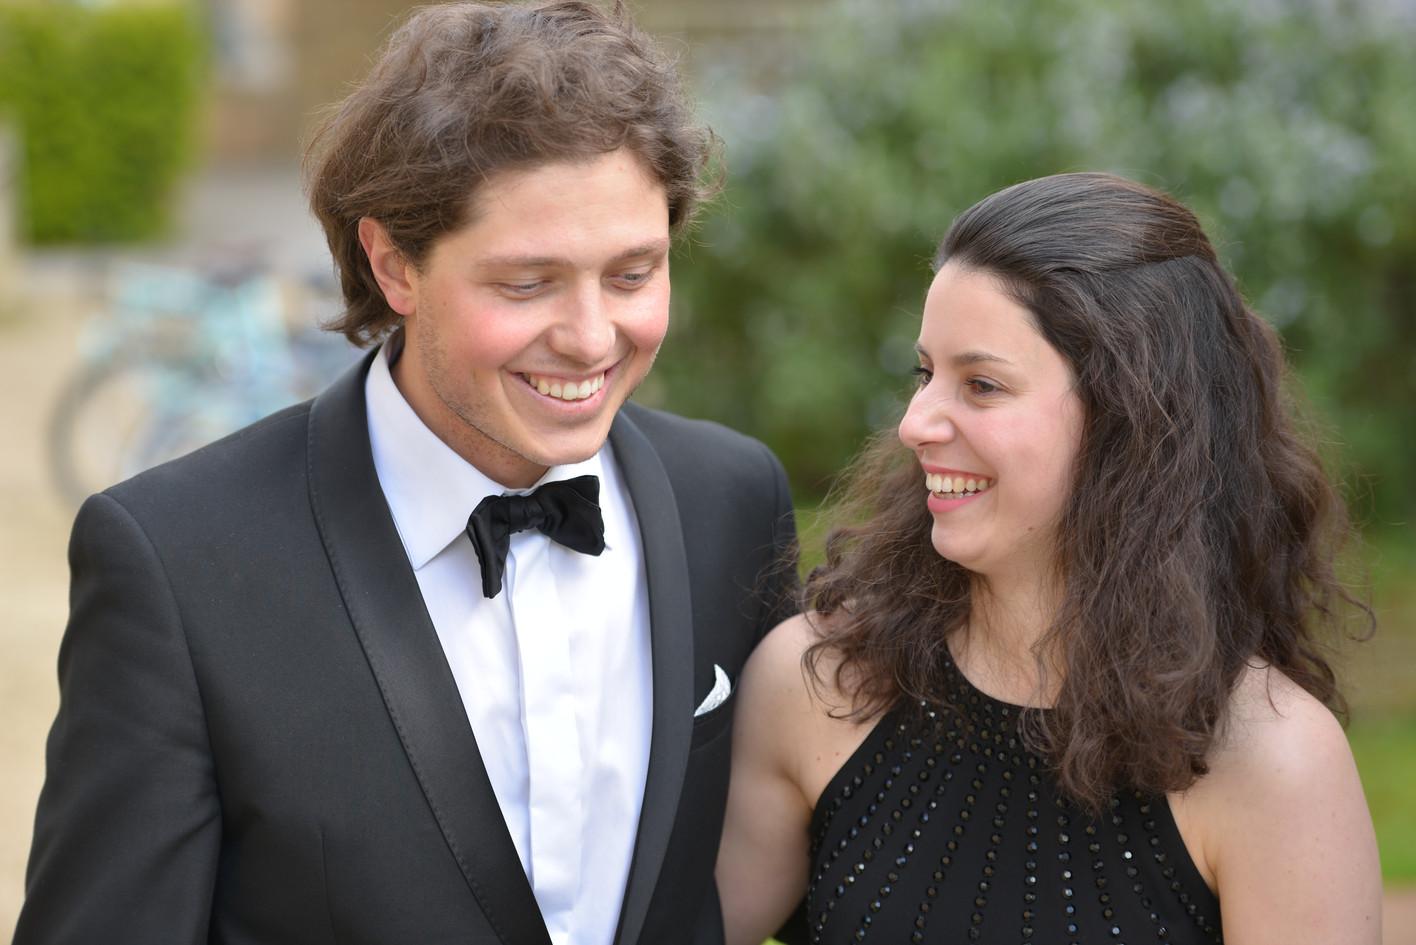 Fabian Langguth & Camille Lemonnier, (c) Julian Guidera